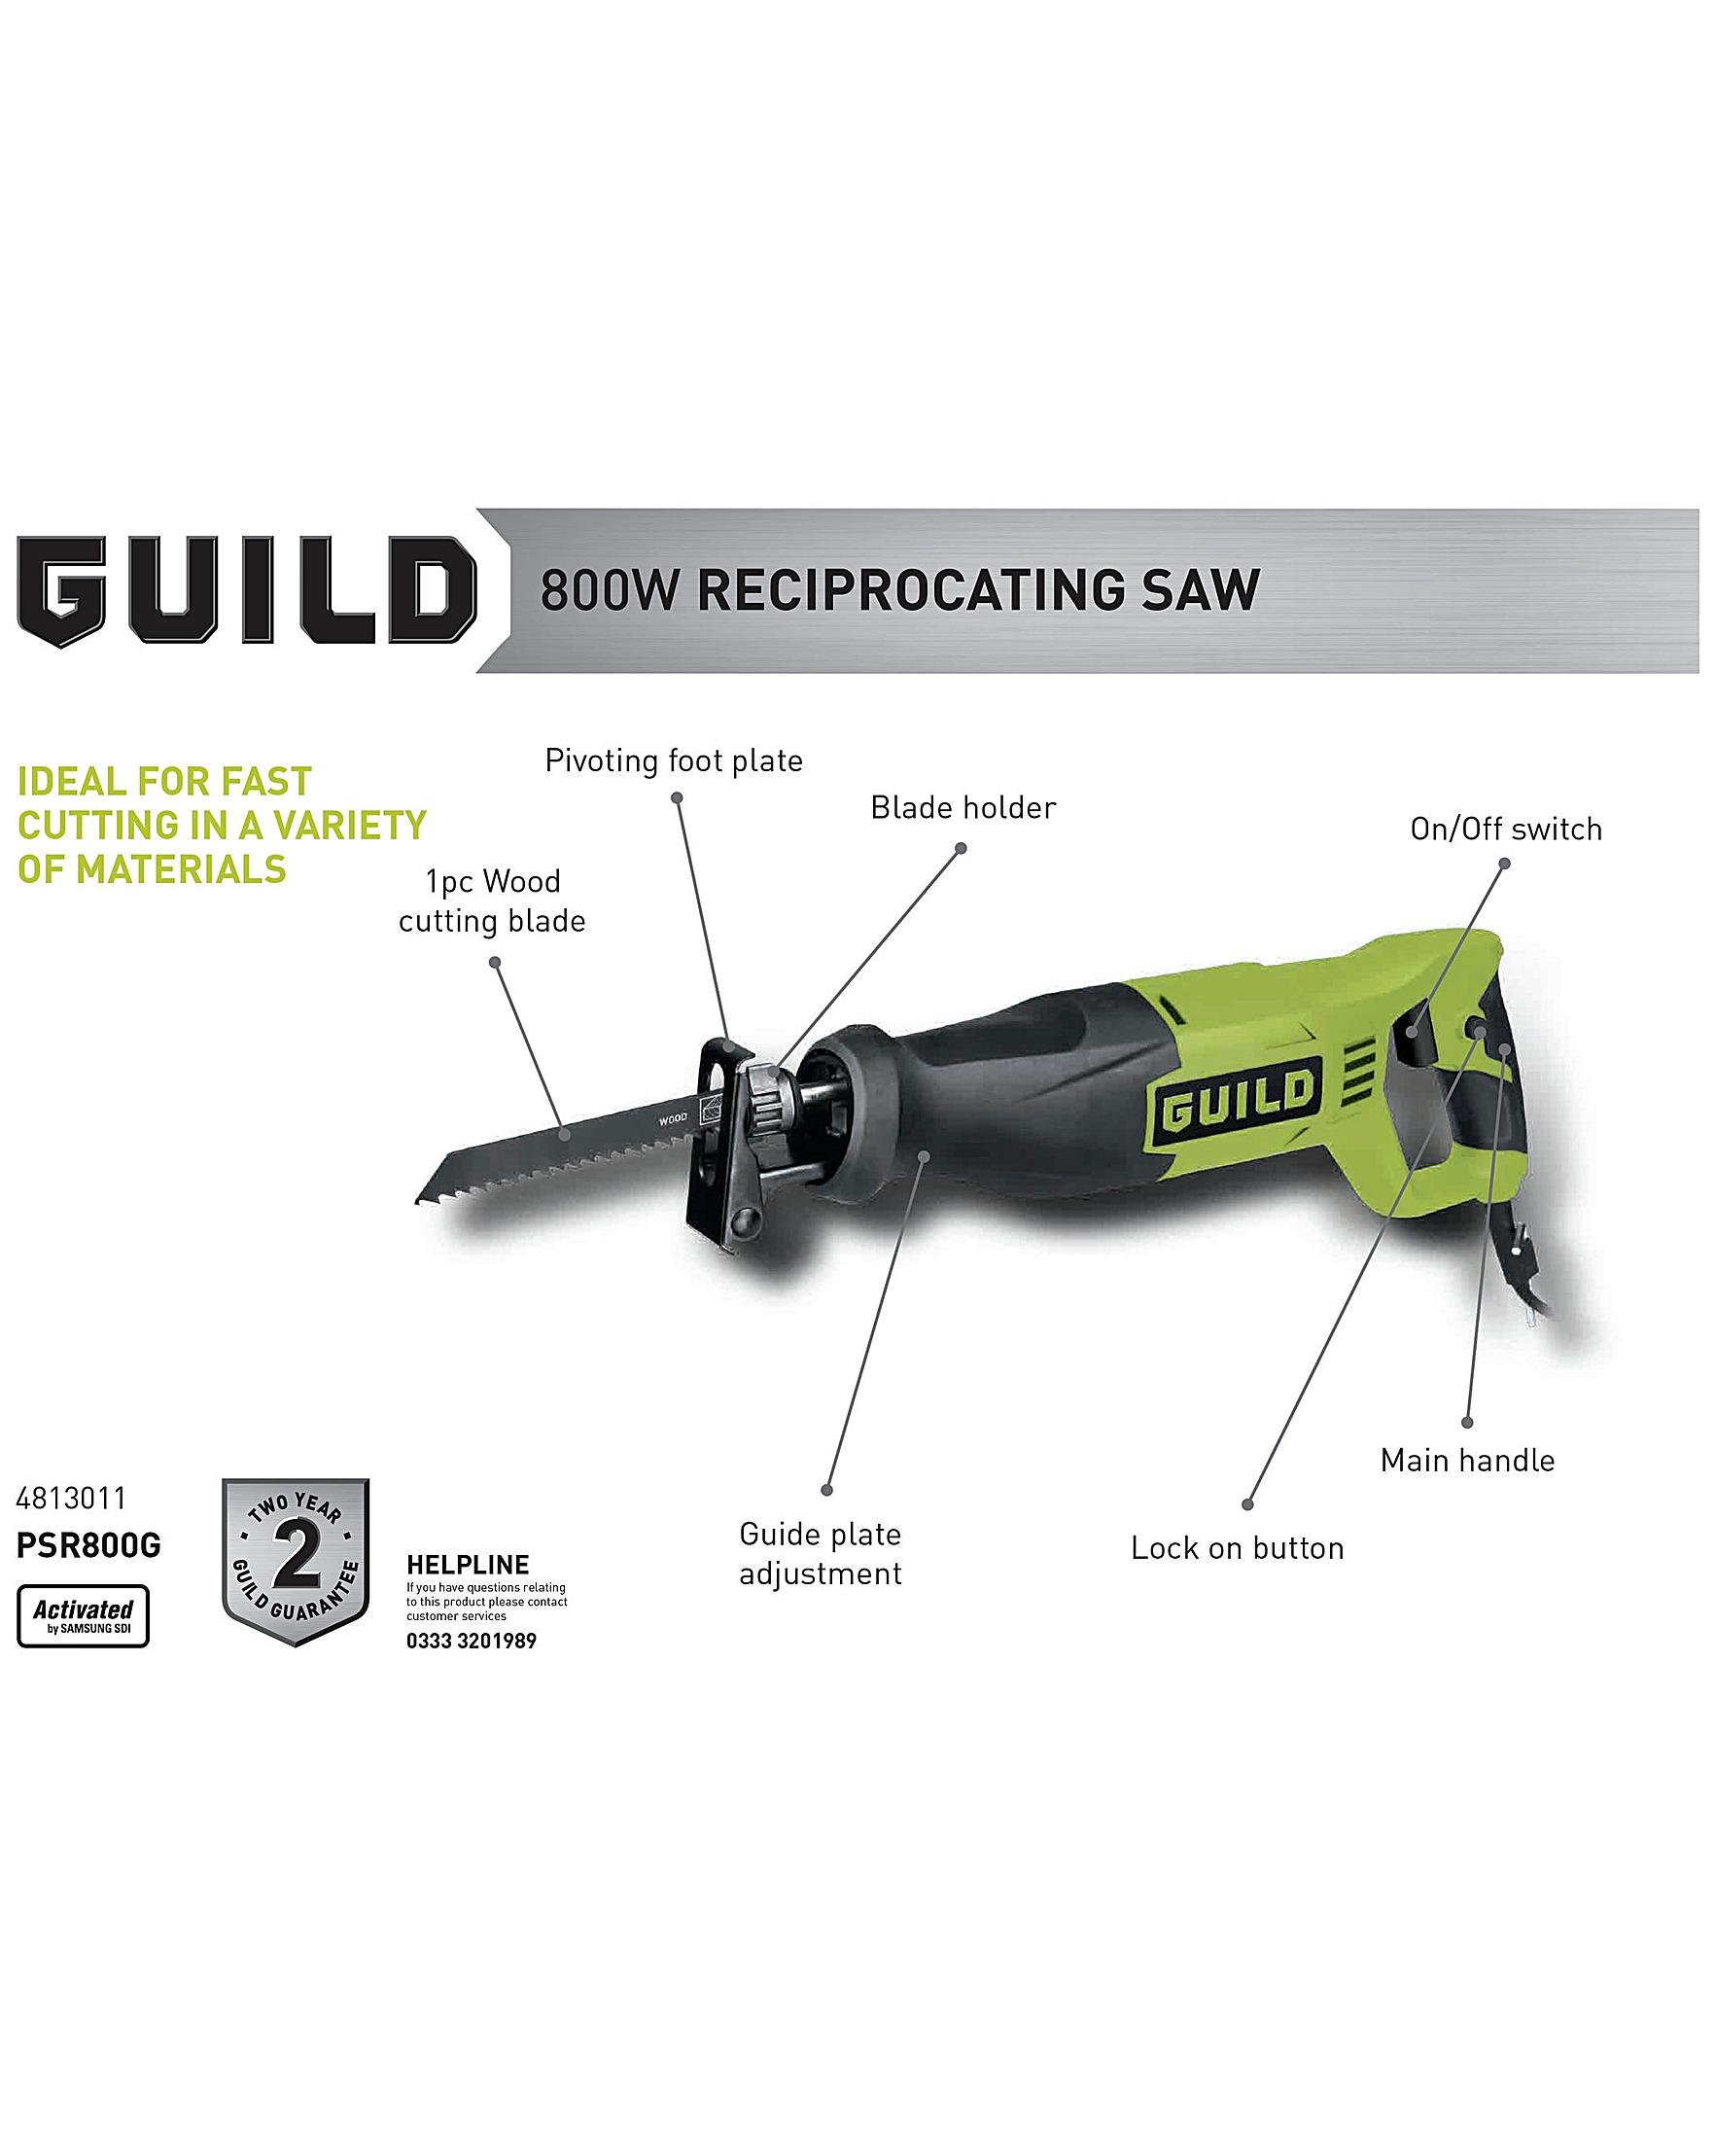 Guild reciprocating saw 800w premier man keyboard keysfo Choice Image